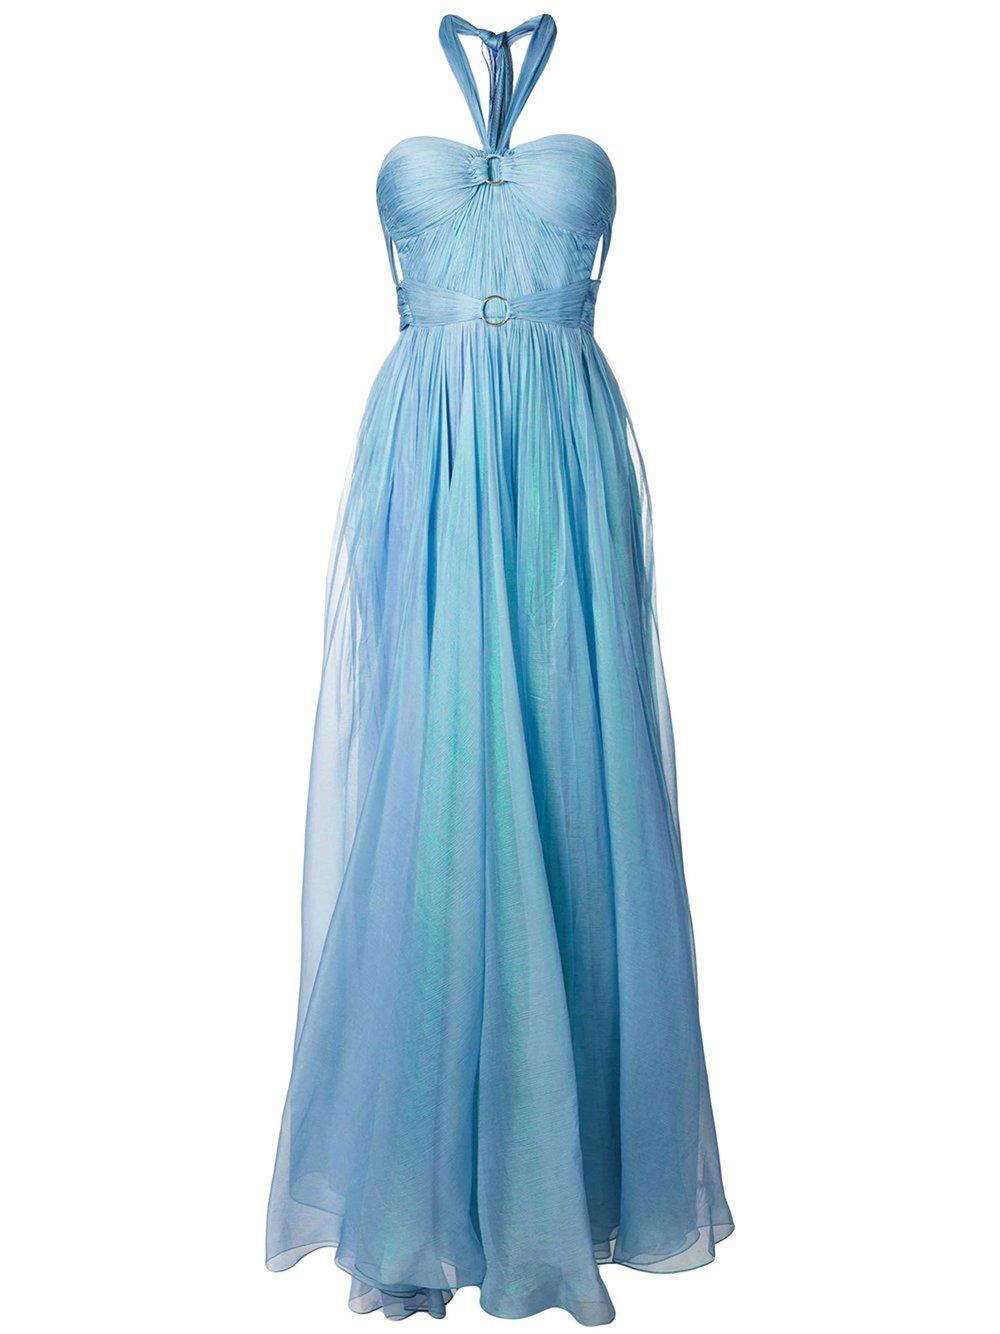 Halterneck Strapless Gown by Maria Lucia Hohan $2,674 露背抹胸晚禮服